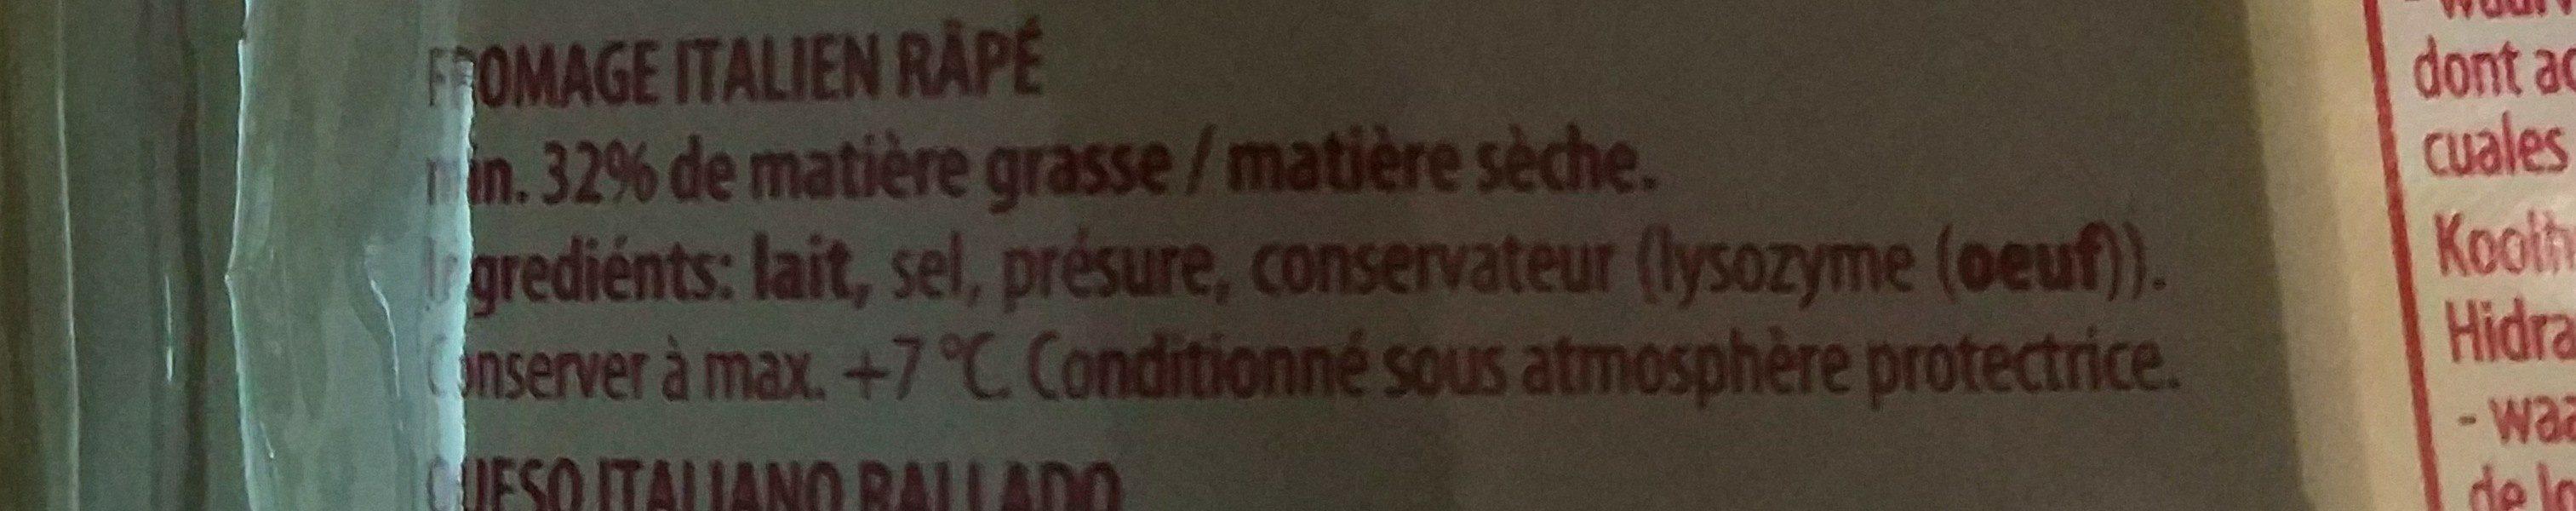 Grana Padano Rapée - Ingrediënten - fr